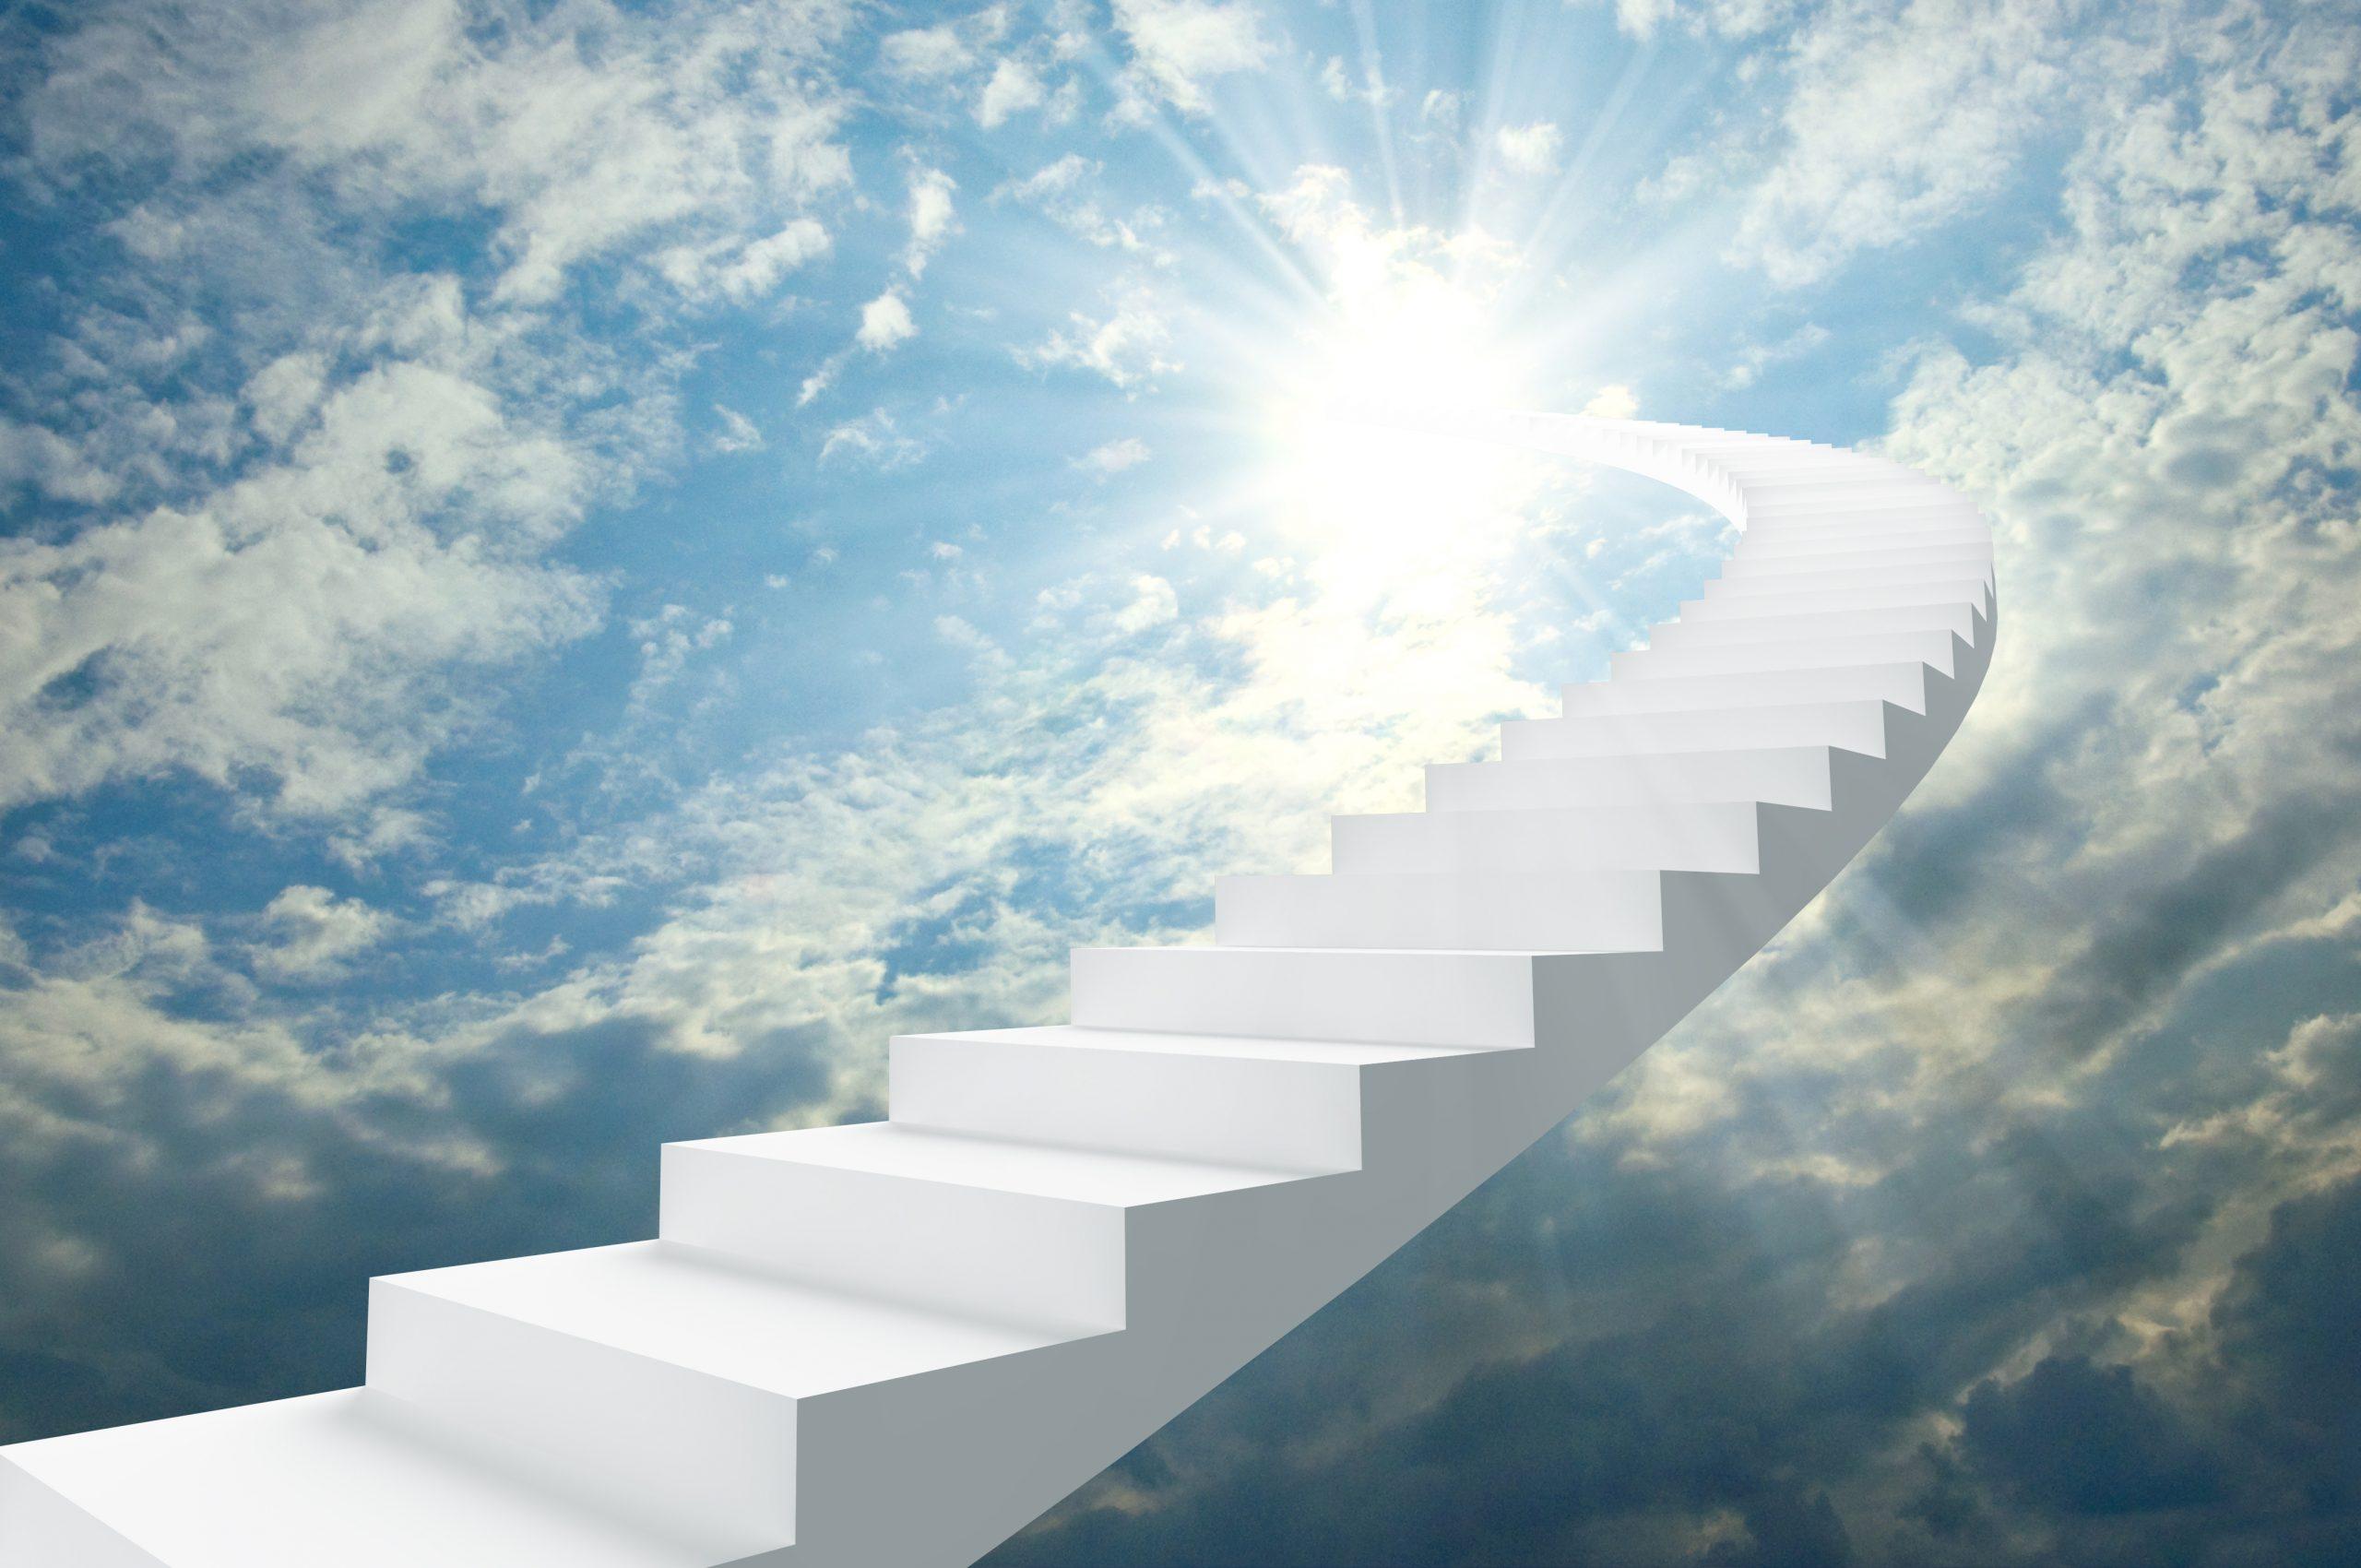 https://depositphotos.com/5997756/stock-photo-stairway-to-heaven.html